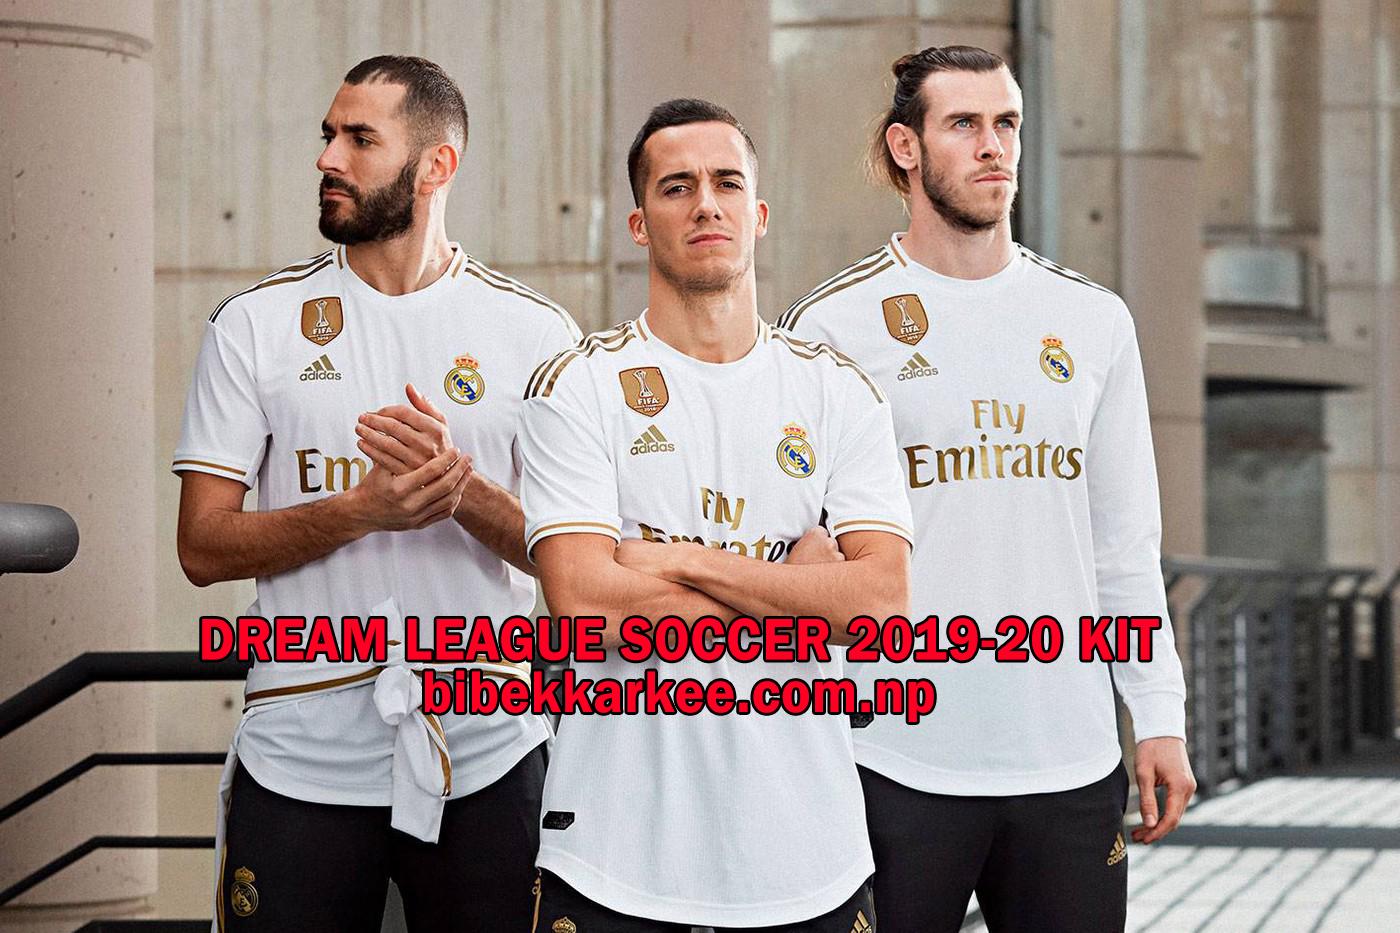 size 40 dcc09 6d835 Real Madrid 2019-20 Dream League Soccer Kit and Logo- La ...